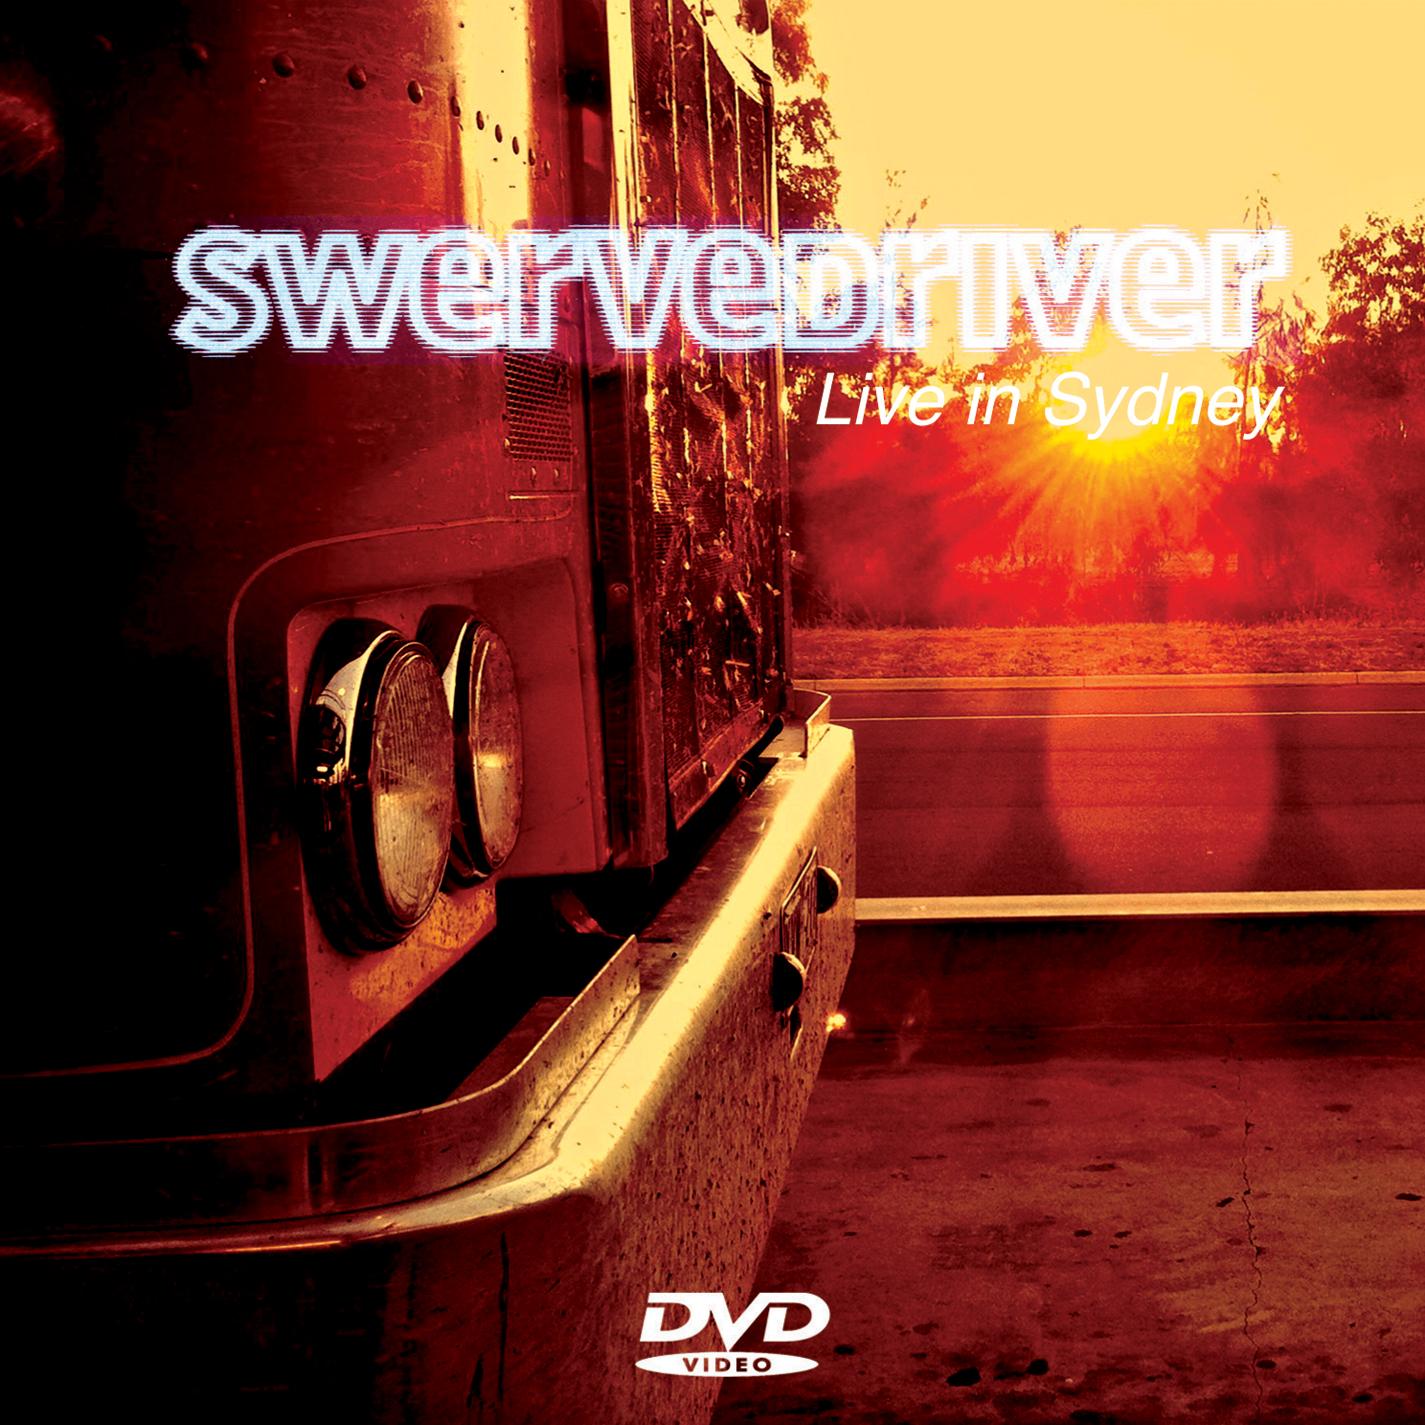 Swervedriver: Live in Sydney